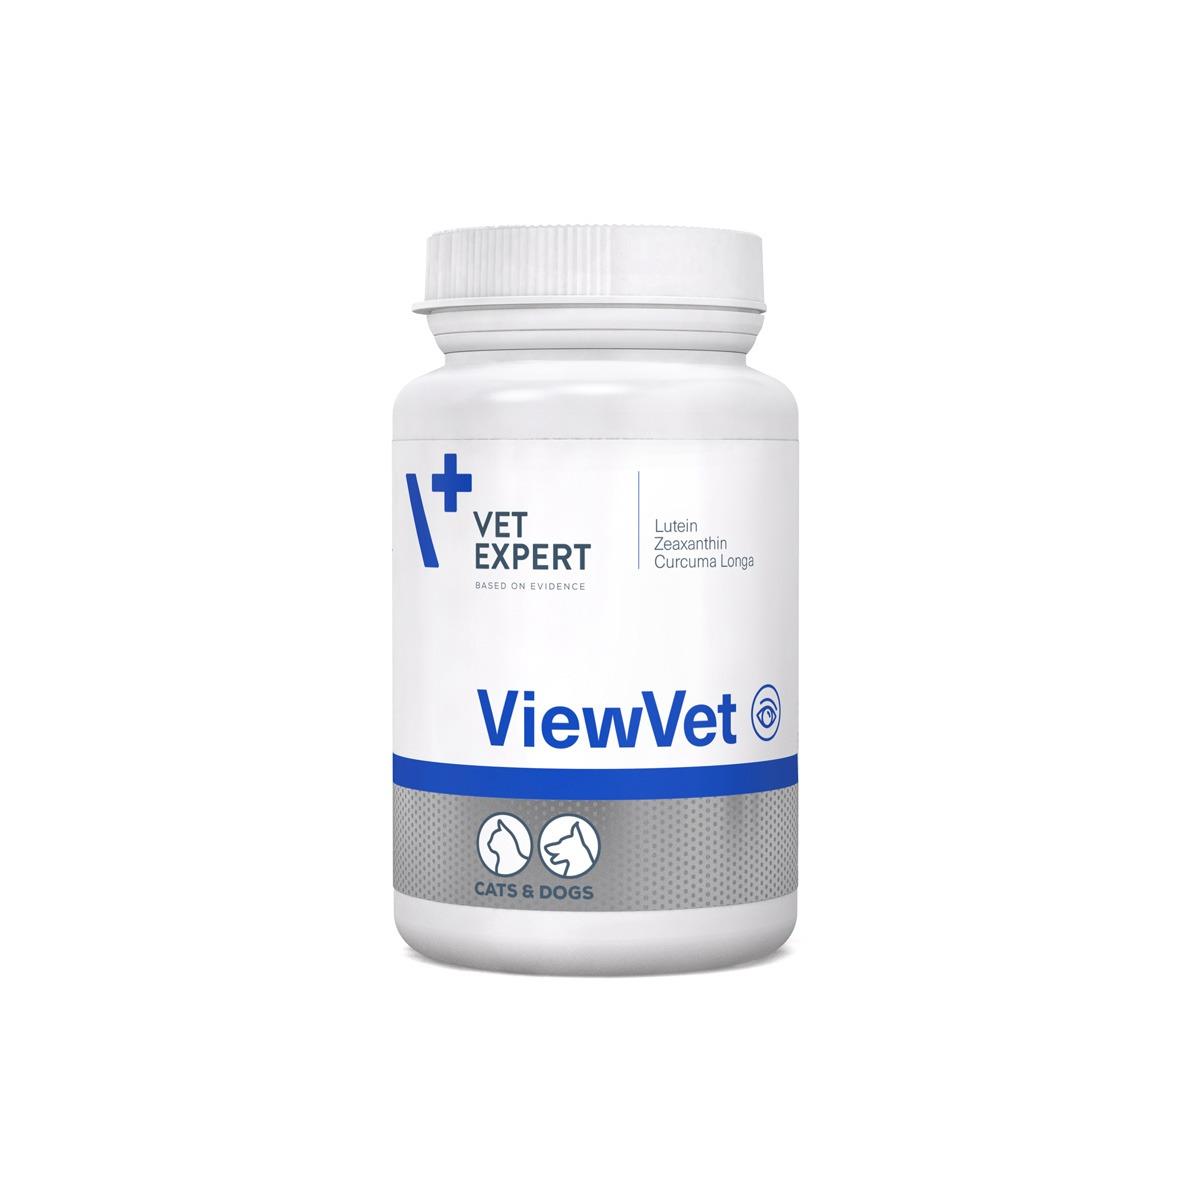 VetExpert ViewVet 45 Kapseln Twist-Off Diätergänzungsfuttermittel Tierarztbedarf, Veterinärbedarf, Veterinärmedizin, Praxisbedarf, Ergänzungsfuttermittel, Tierarztprodukten, Tierapotheke, Tierpflegeprodukte